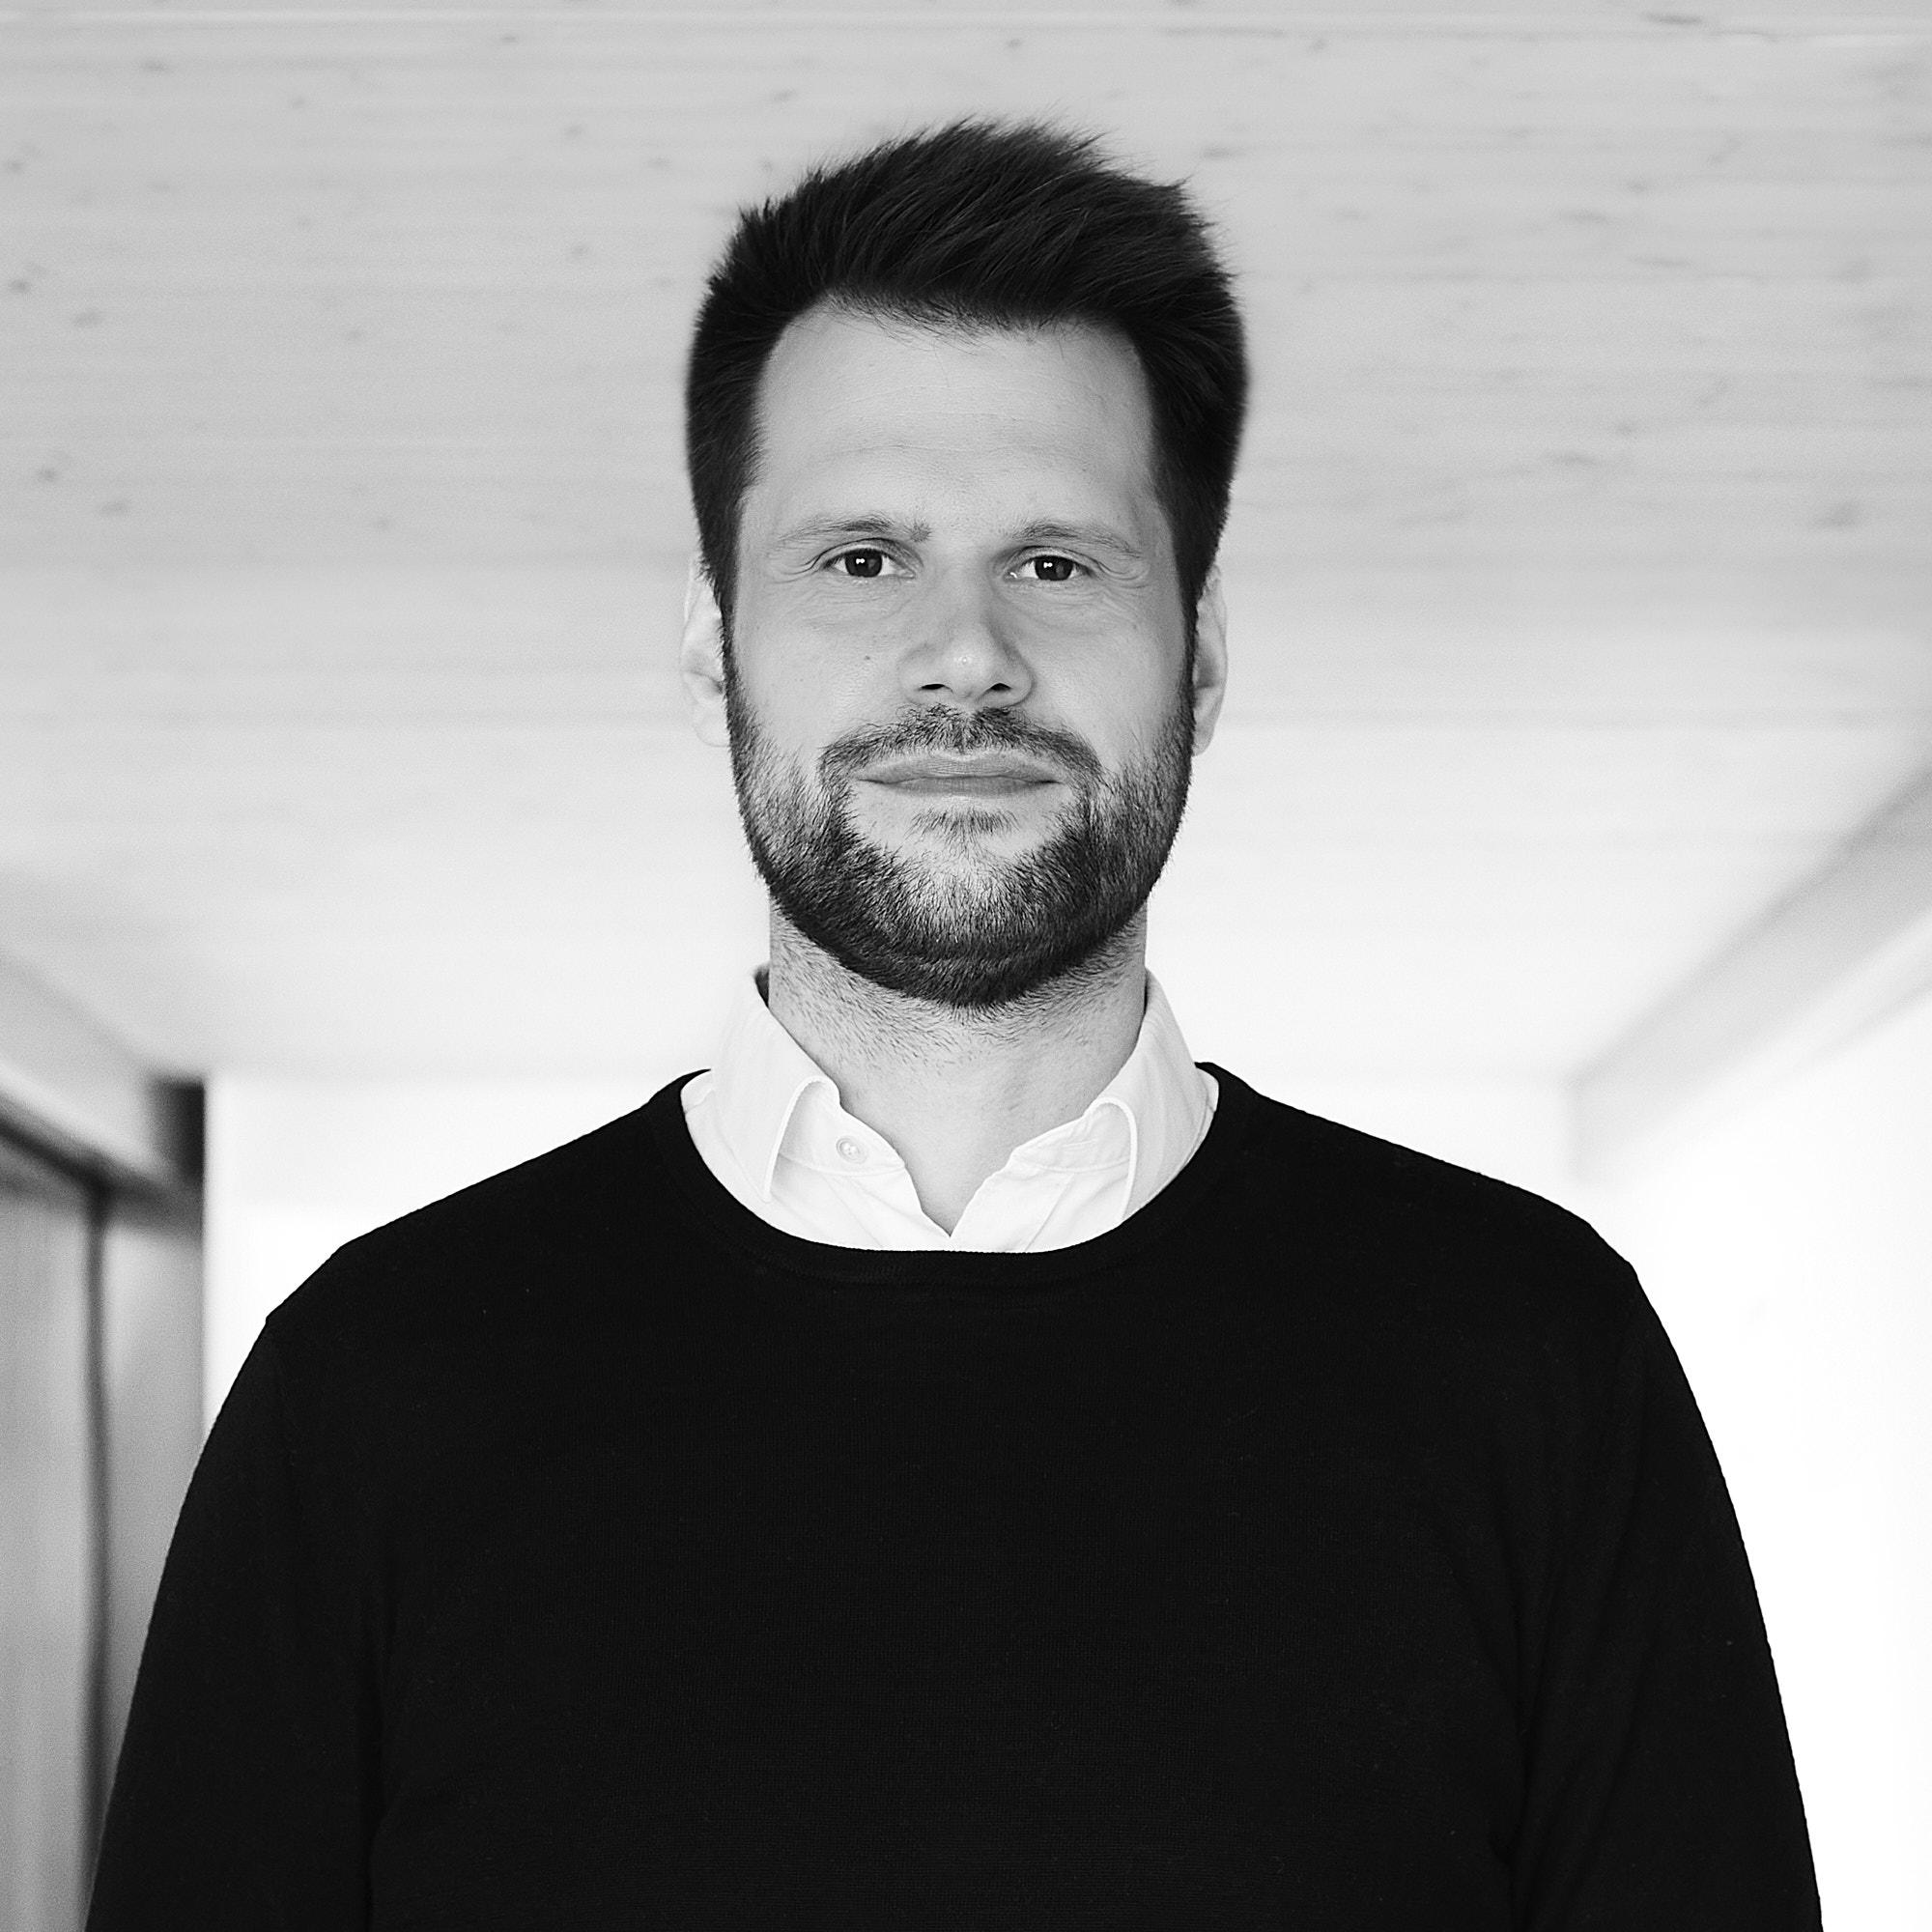 Finn-Rasmus Bull